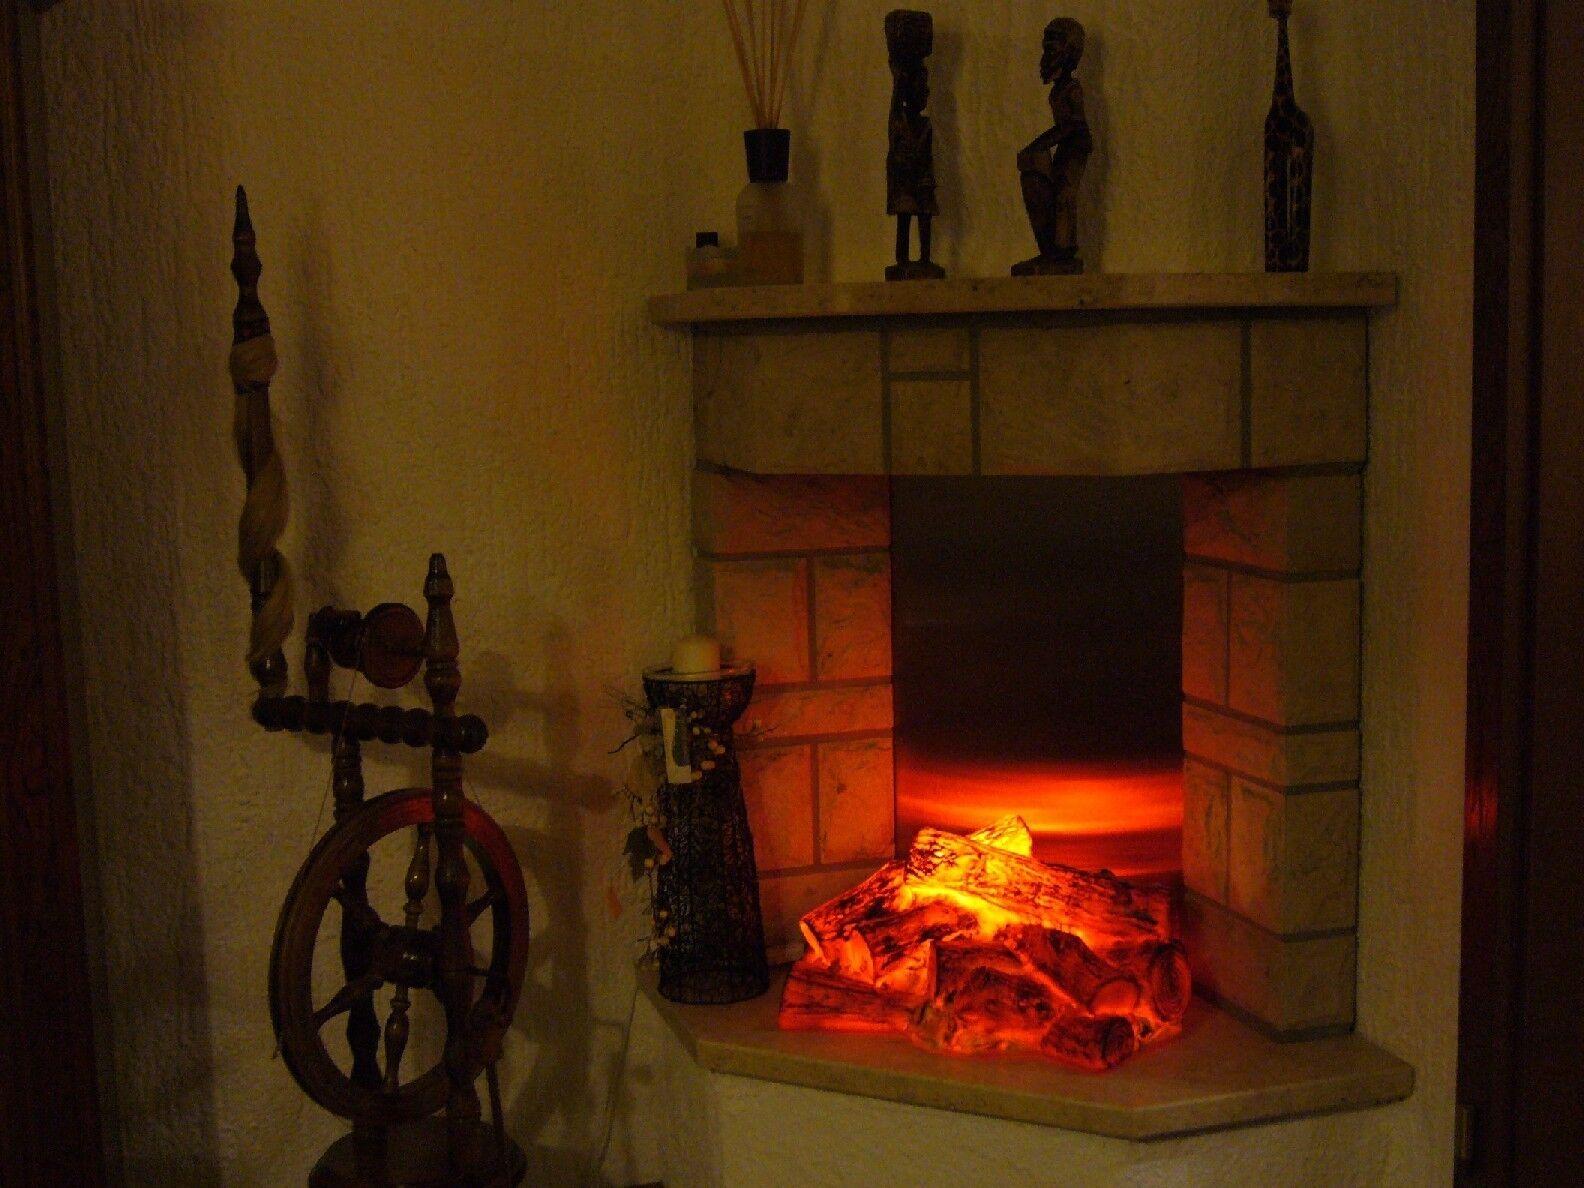 kaminfeuer elektrisch ambiente pur kamin deko. Black Bedroom Furniture Sets. Home Design Ideas